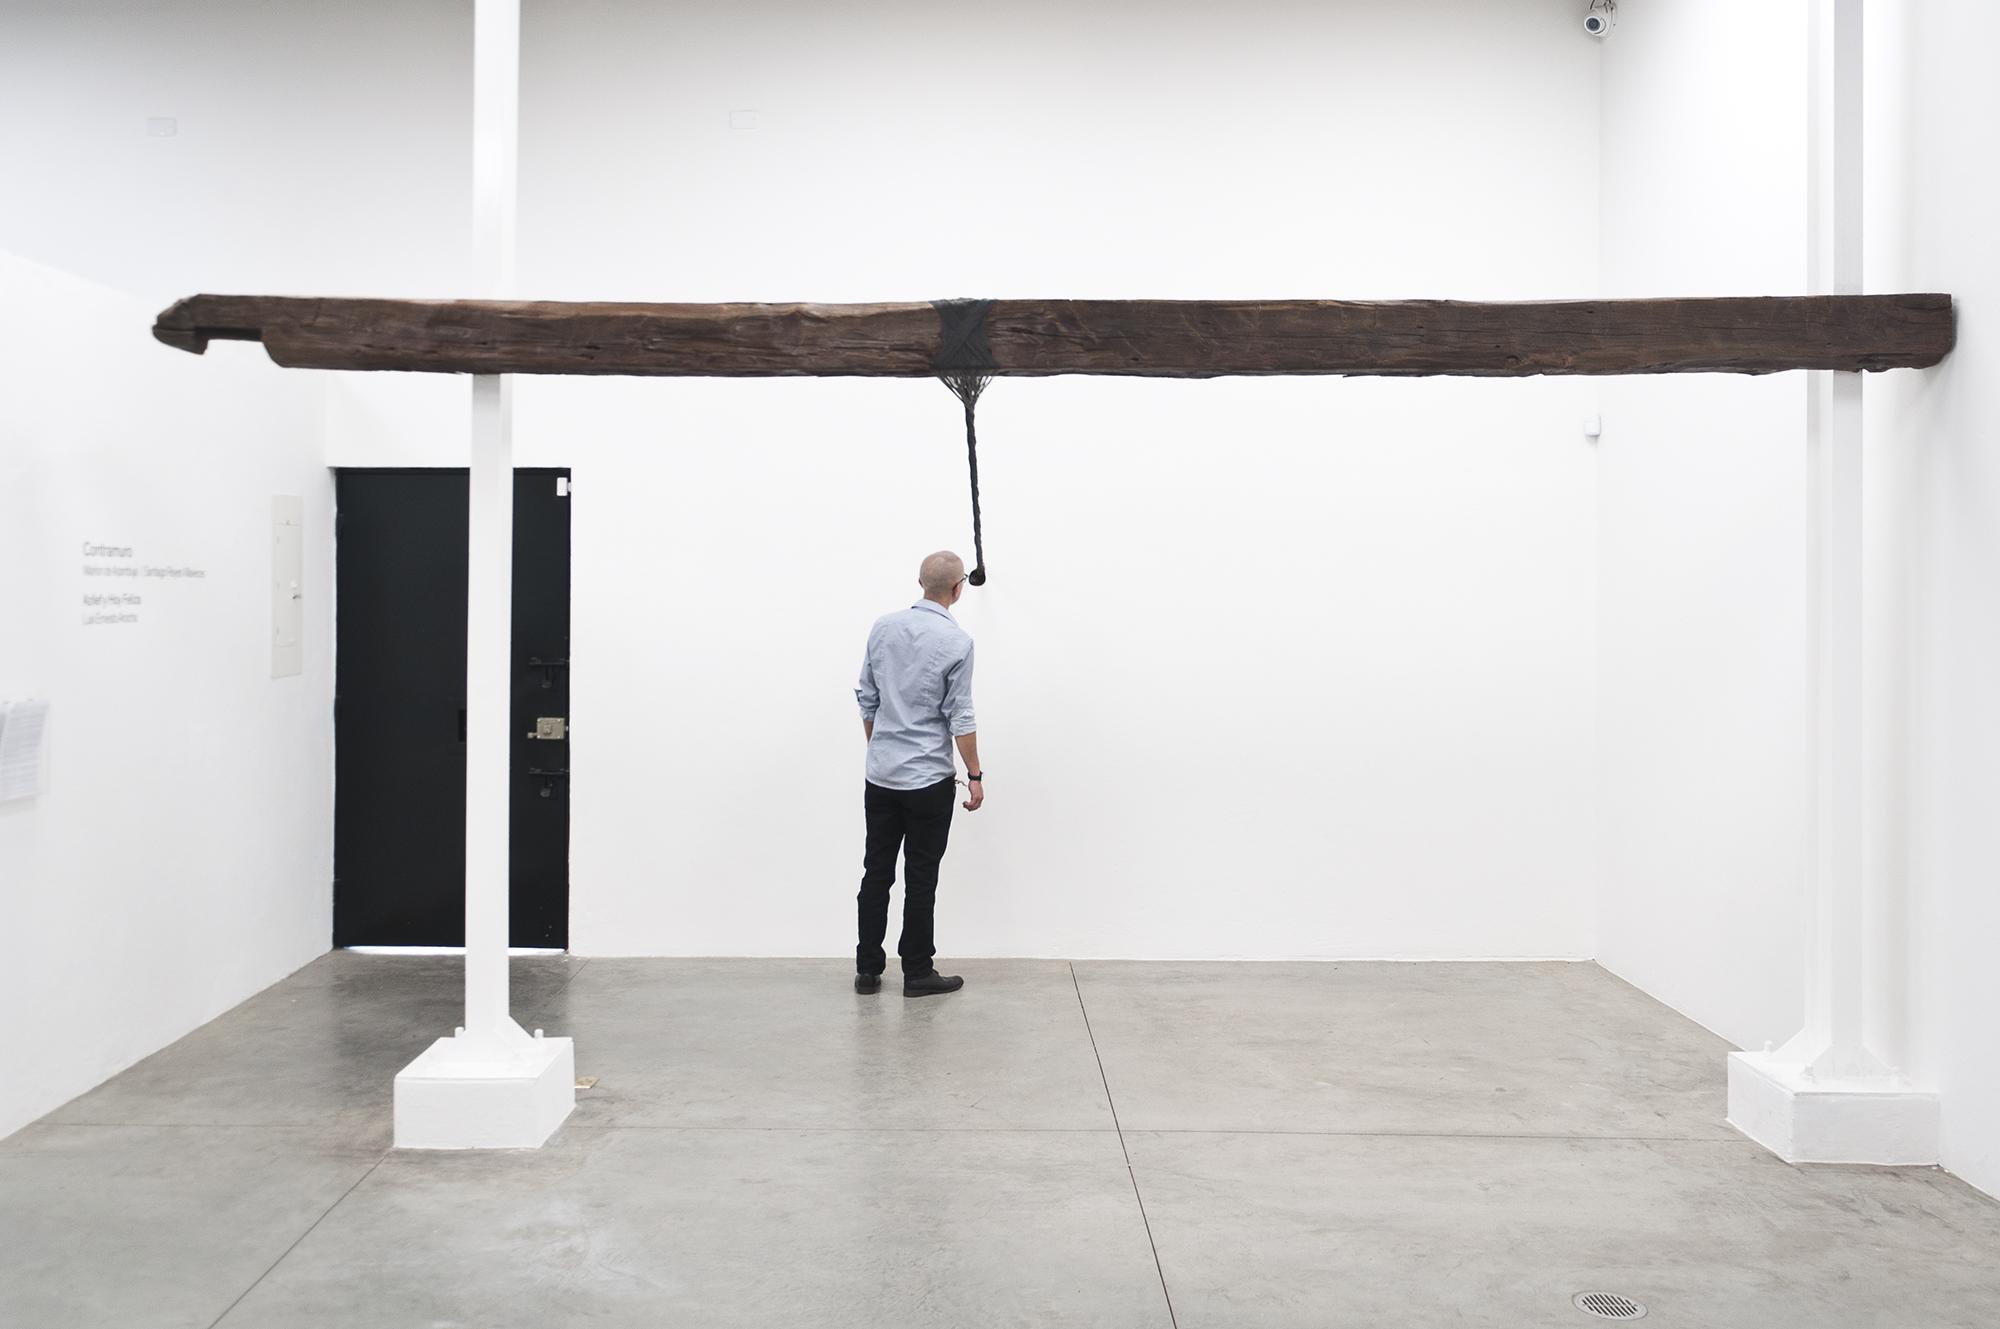 Santiago Reyes Villaveces  ©  2015 ,  Braid . Wood beam and steel wire.  18 x 10 x 15 f (545 x 300 x 450 cm) . Courtesy of the artist. Photo: Sebastian Cruz